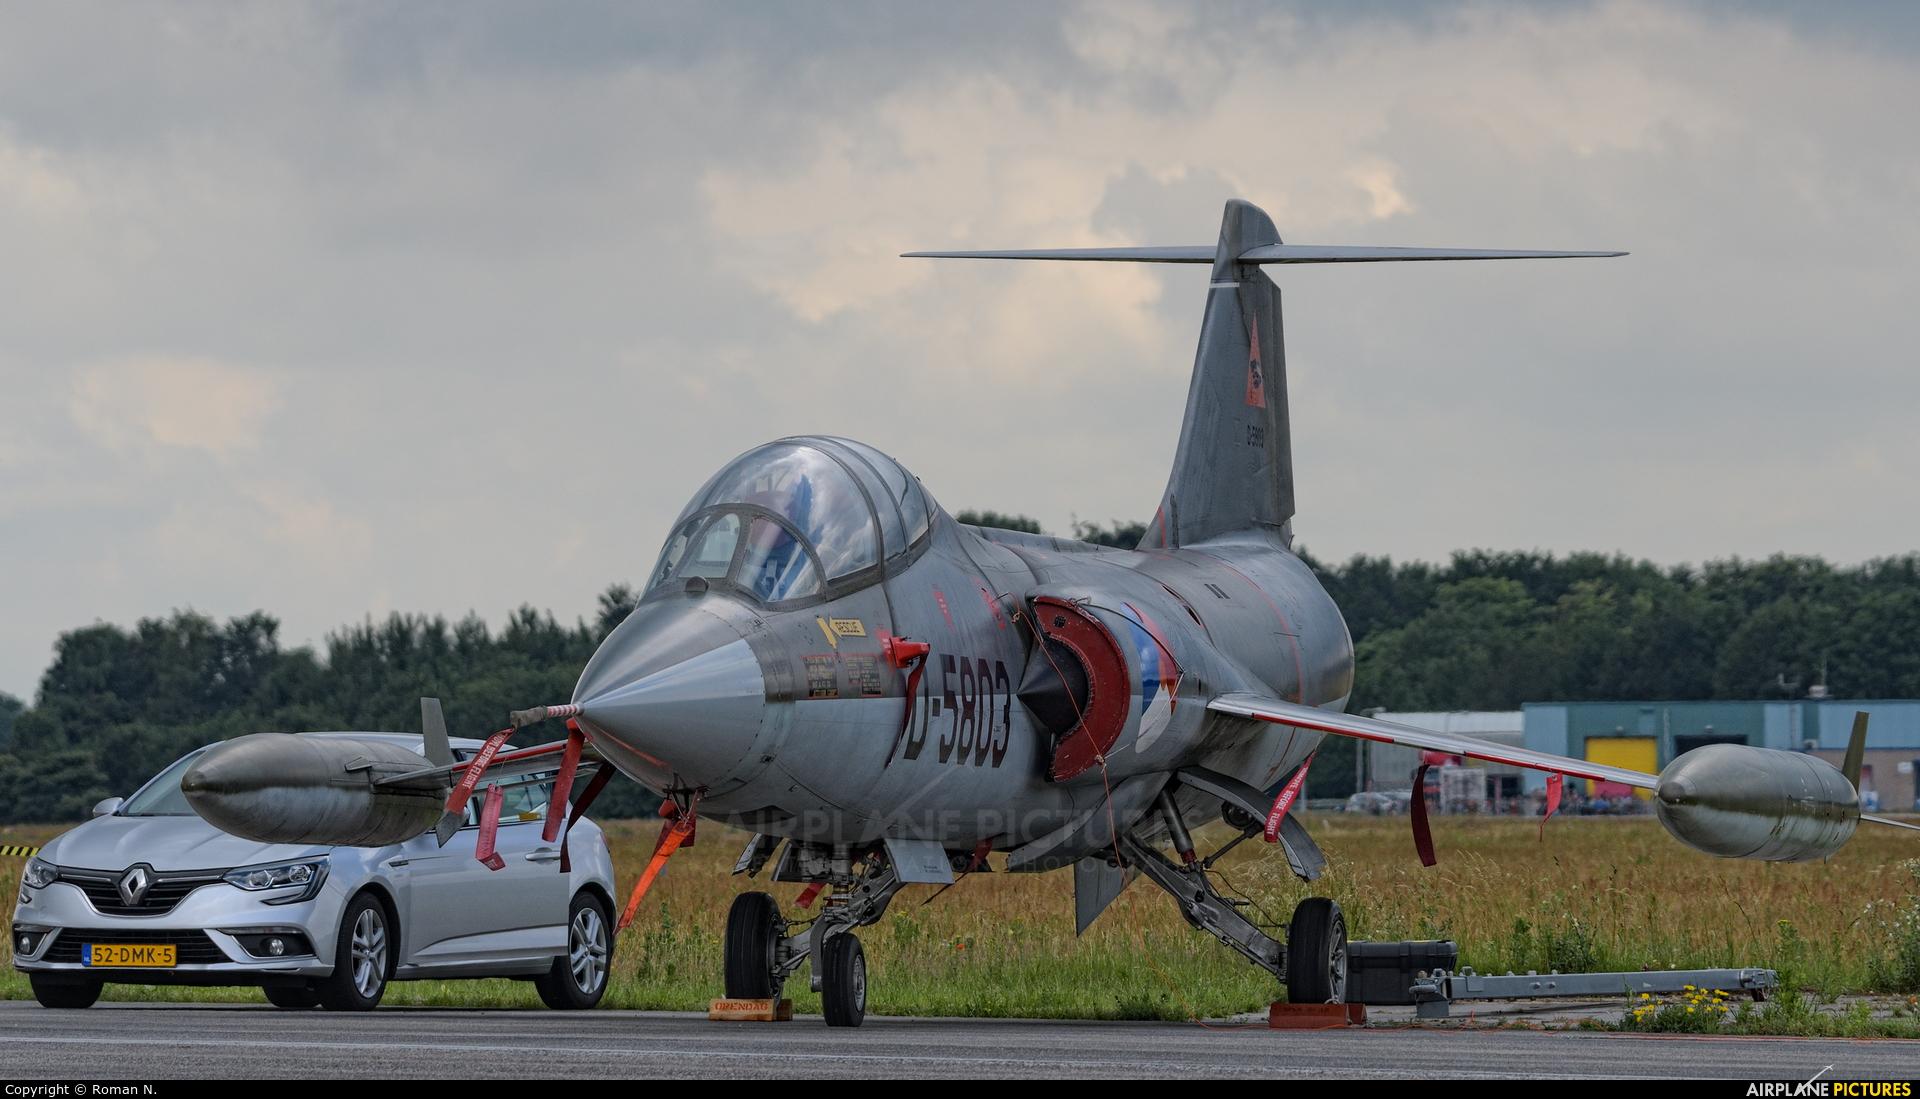 Netherlands - Air Force D-5803 aircraft at Uden - Volkel